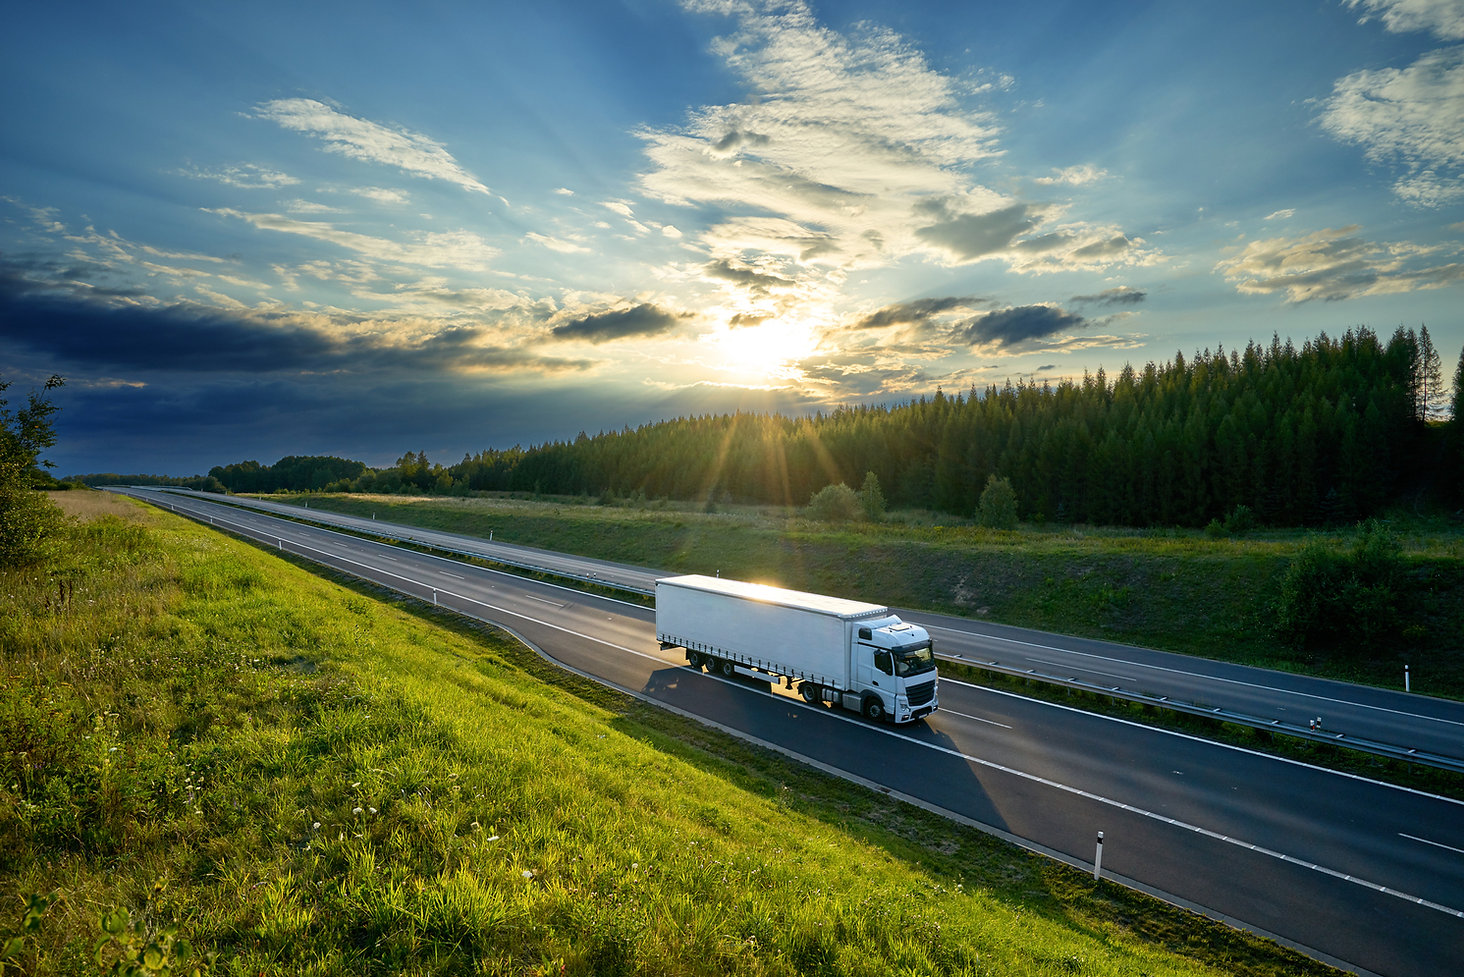 carretera camion.jpg